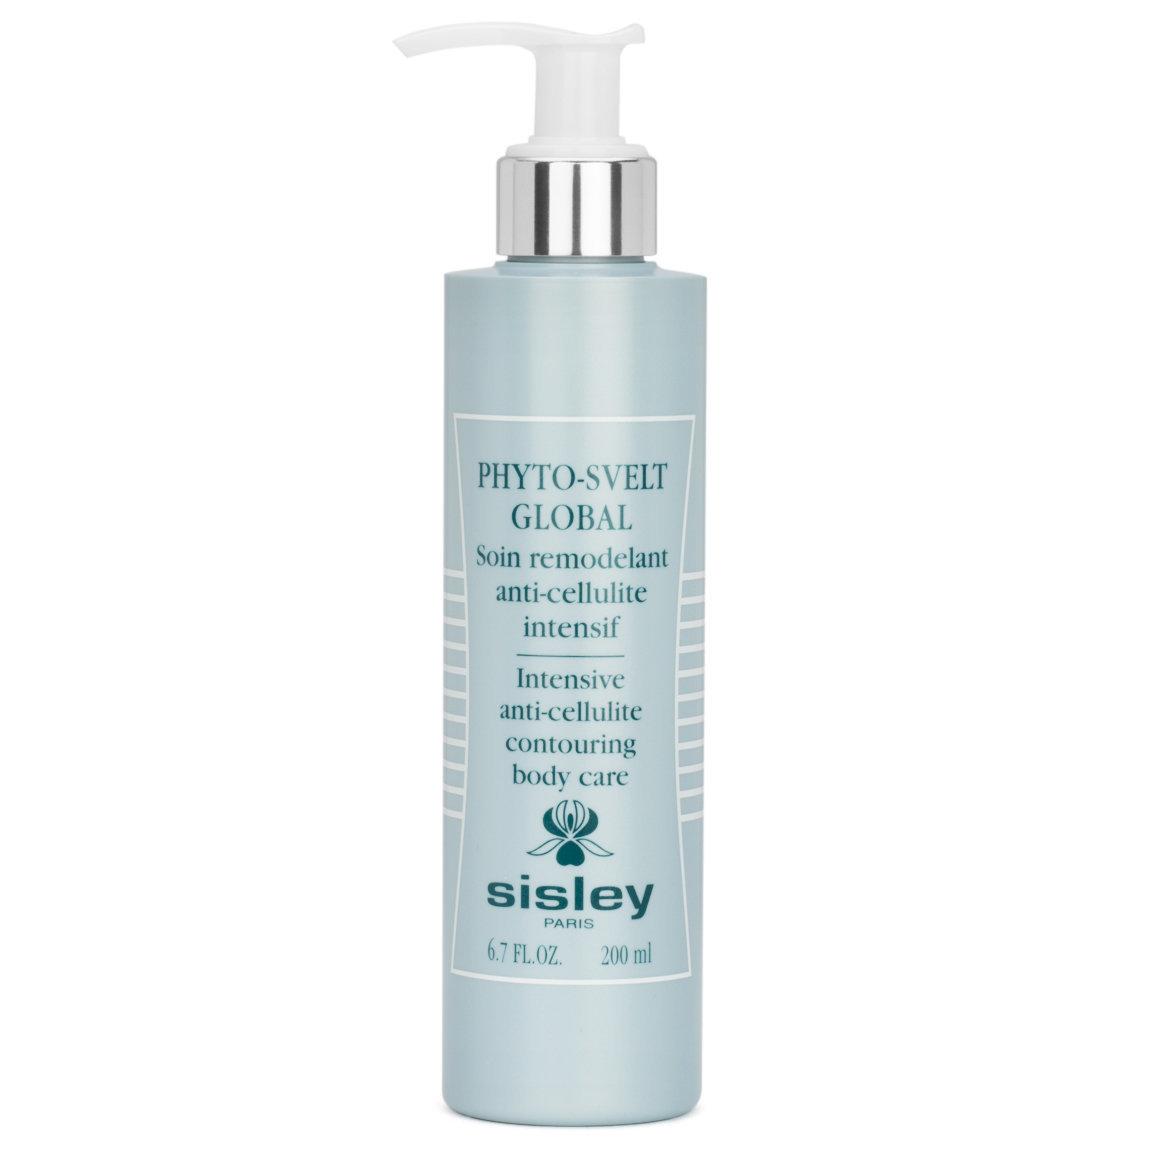 Sisley-Paris Phyto-Svelt Global Intensive Slimming Body Care product swatch.